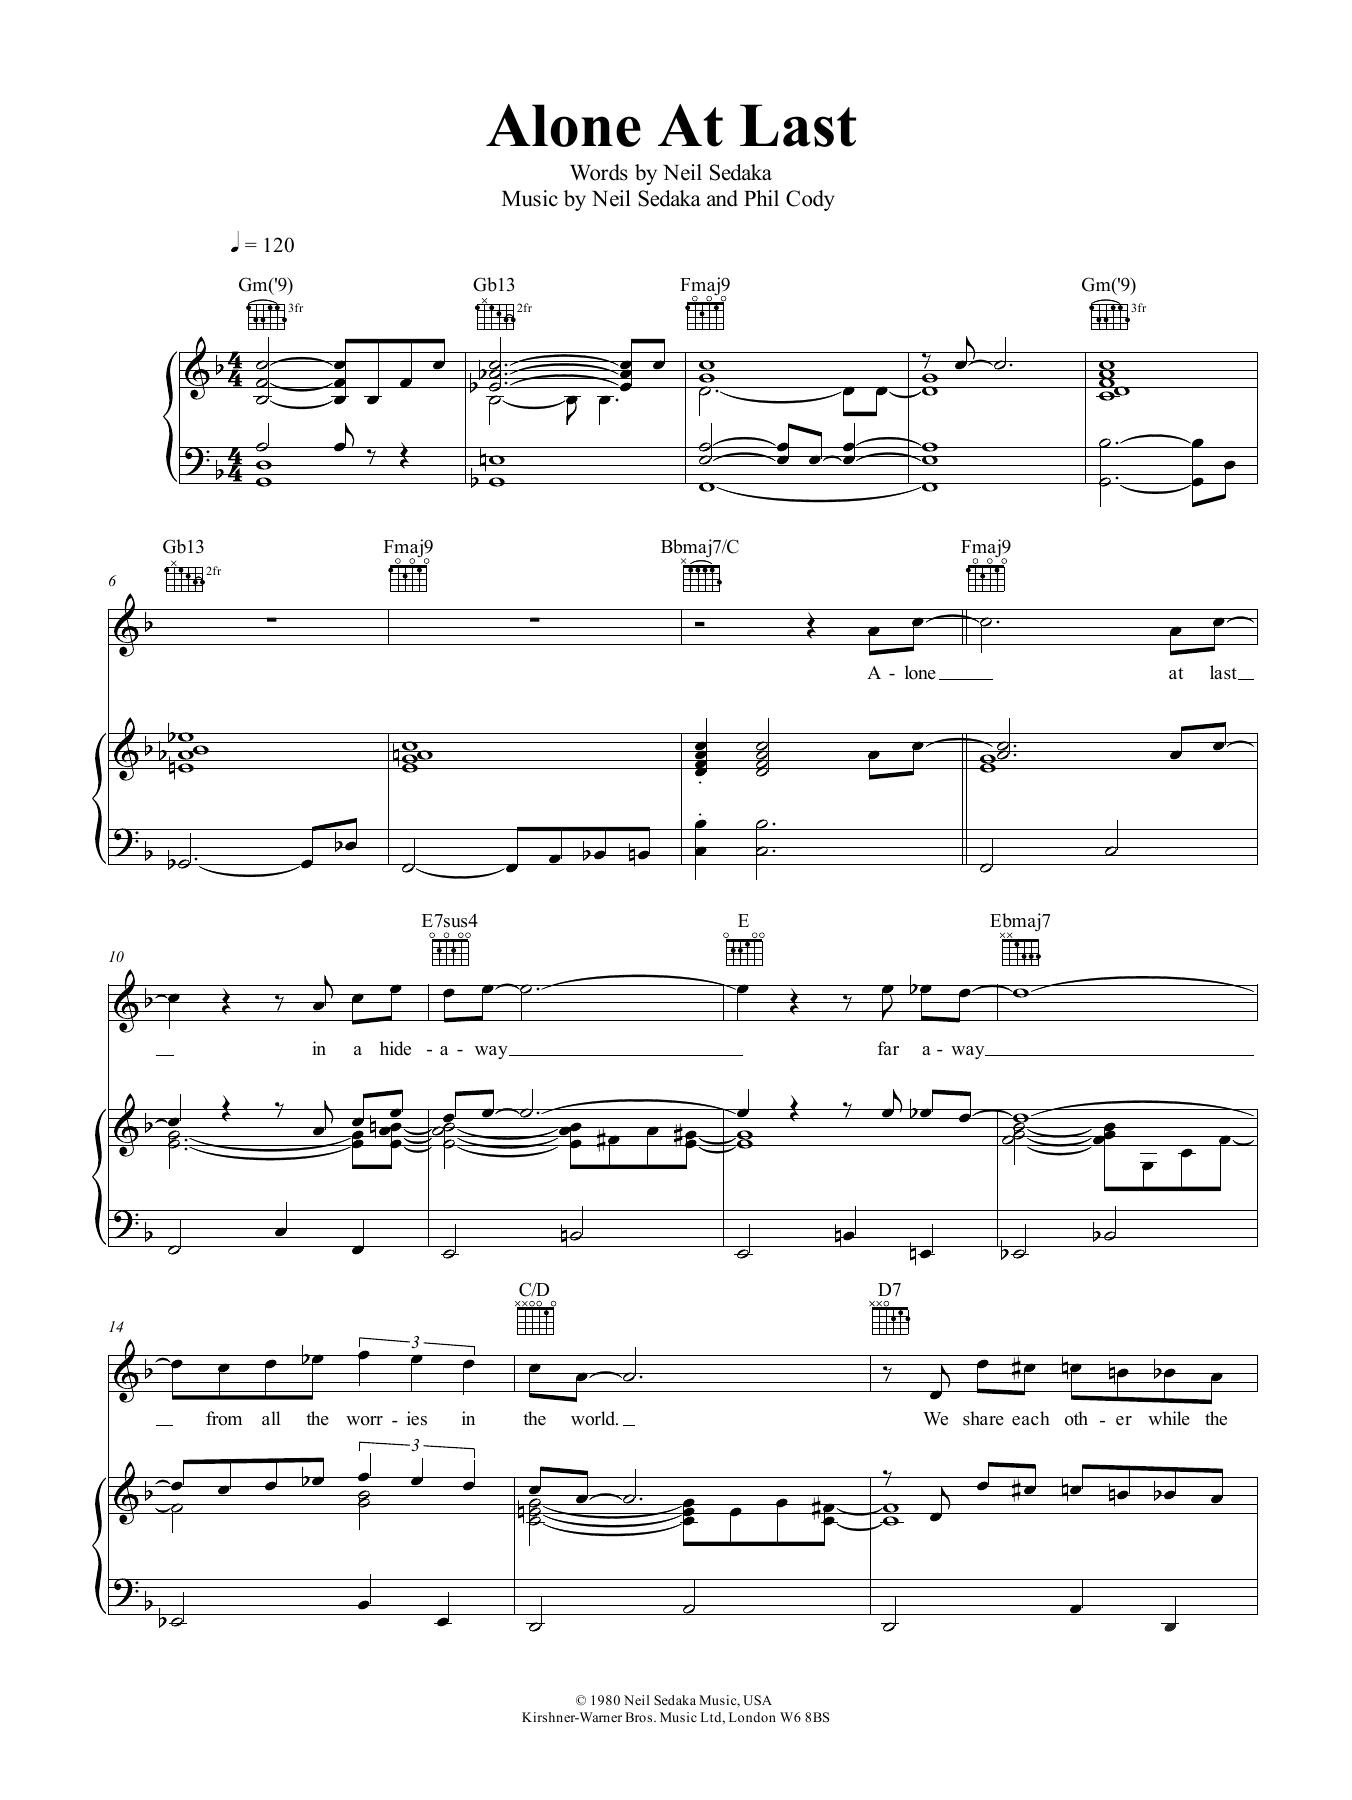 Neil Sedaka Alone At Last sheet music notes and chords. Download Printable PDF.